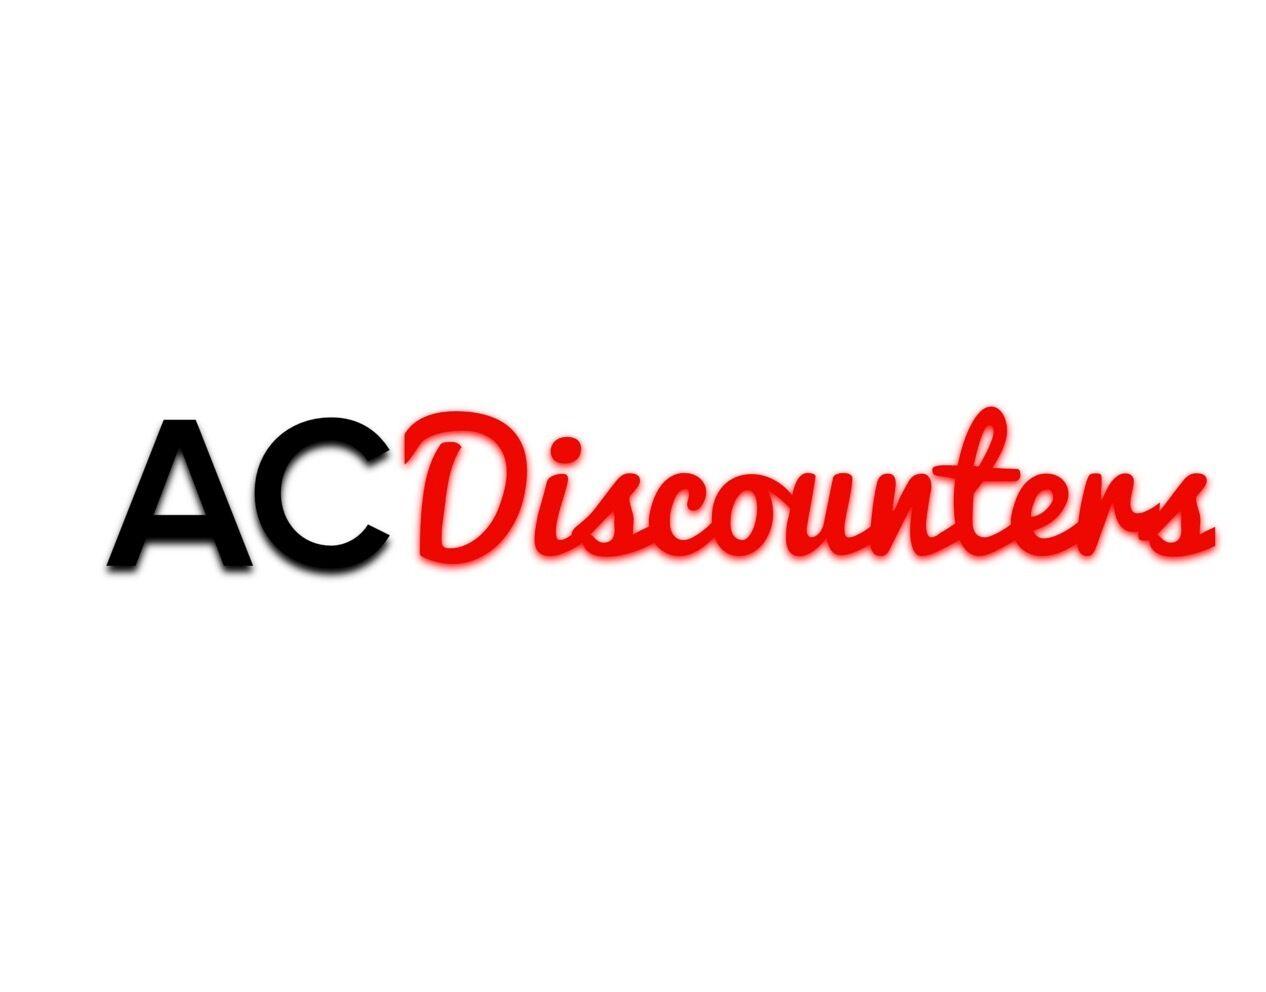 AcDiscounters